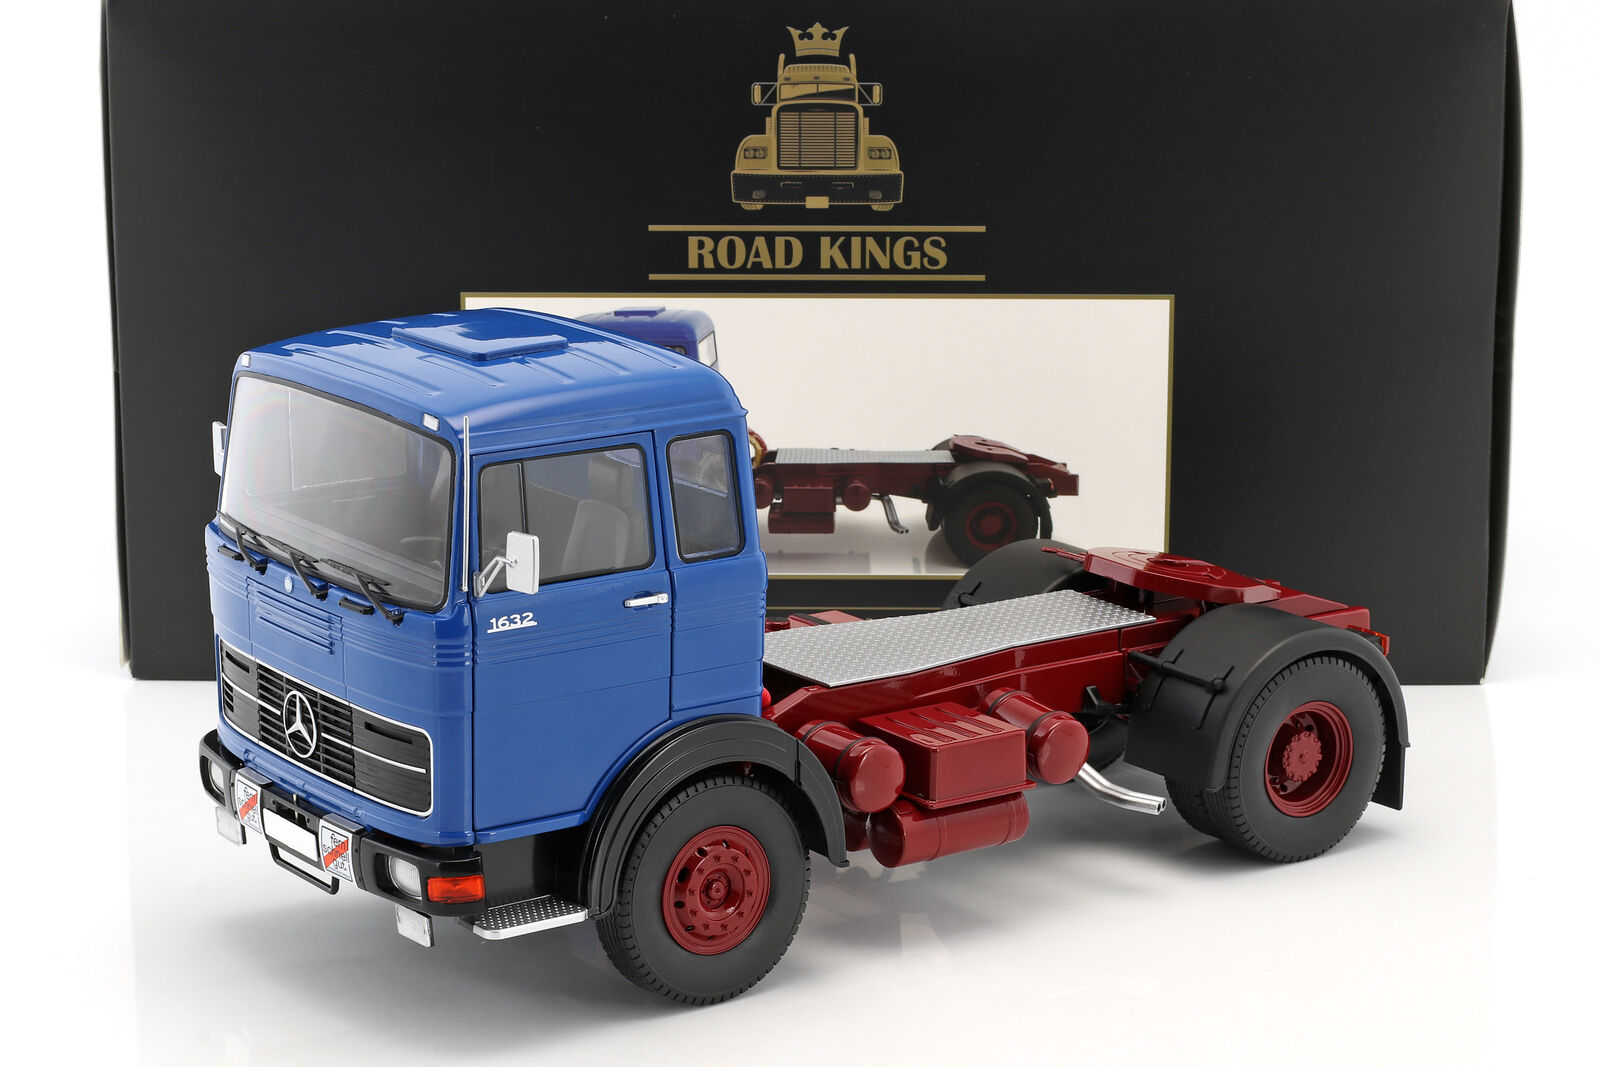 Mercedes-Benz Lps 1632 Cabeza Tractora Año 1969 Azul Azul  Rojo Oscuro 1 18 Road